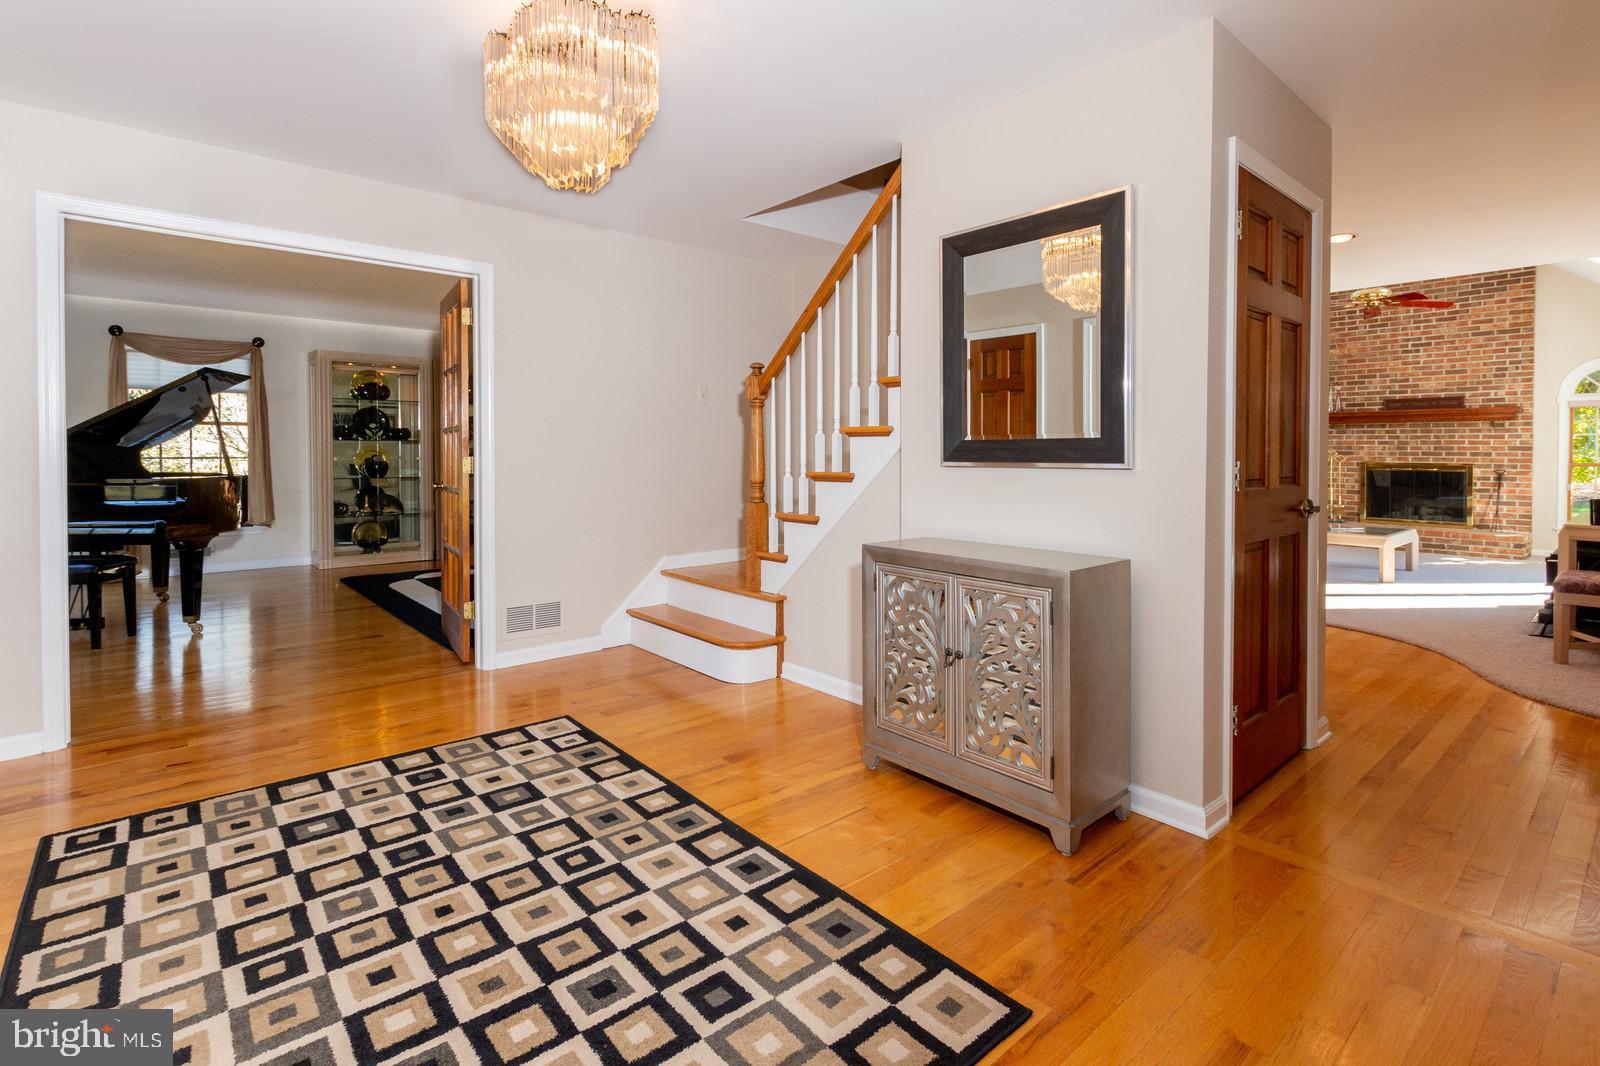 Great Floor Plan with Hardwood Floors Throughout